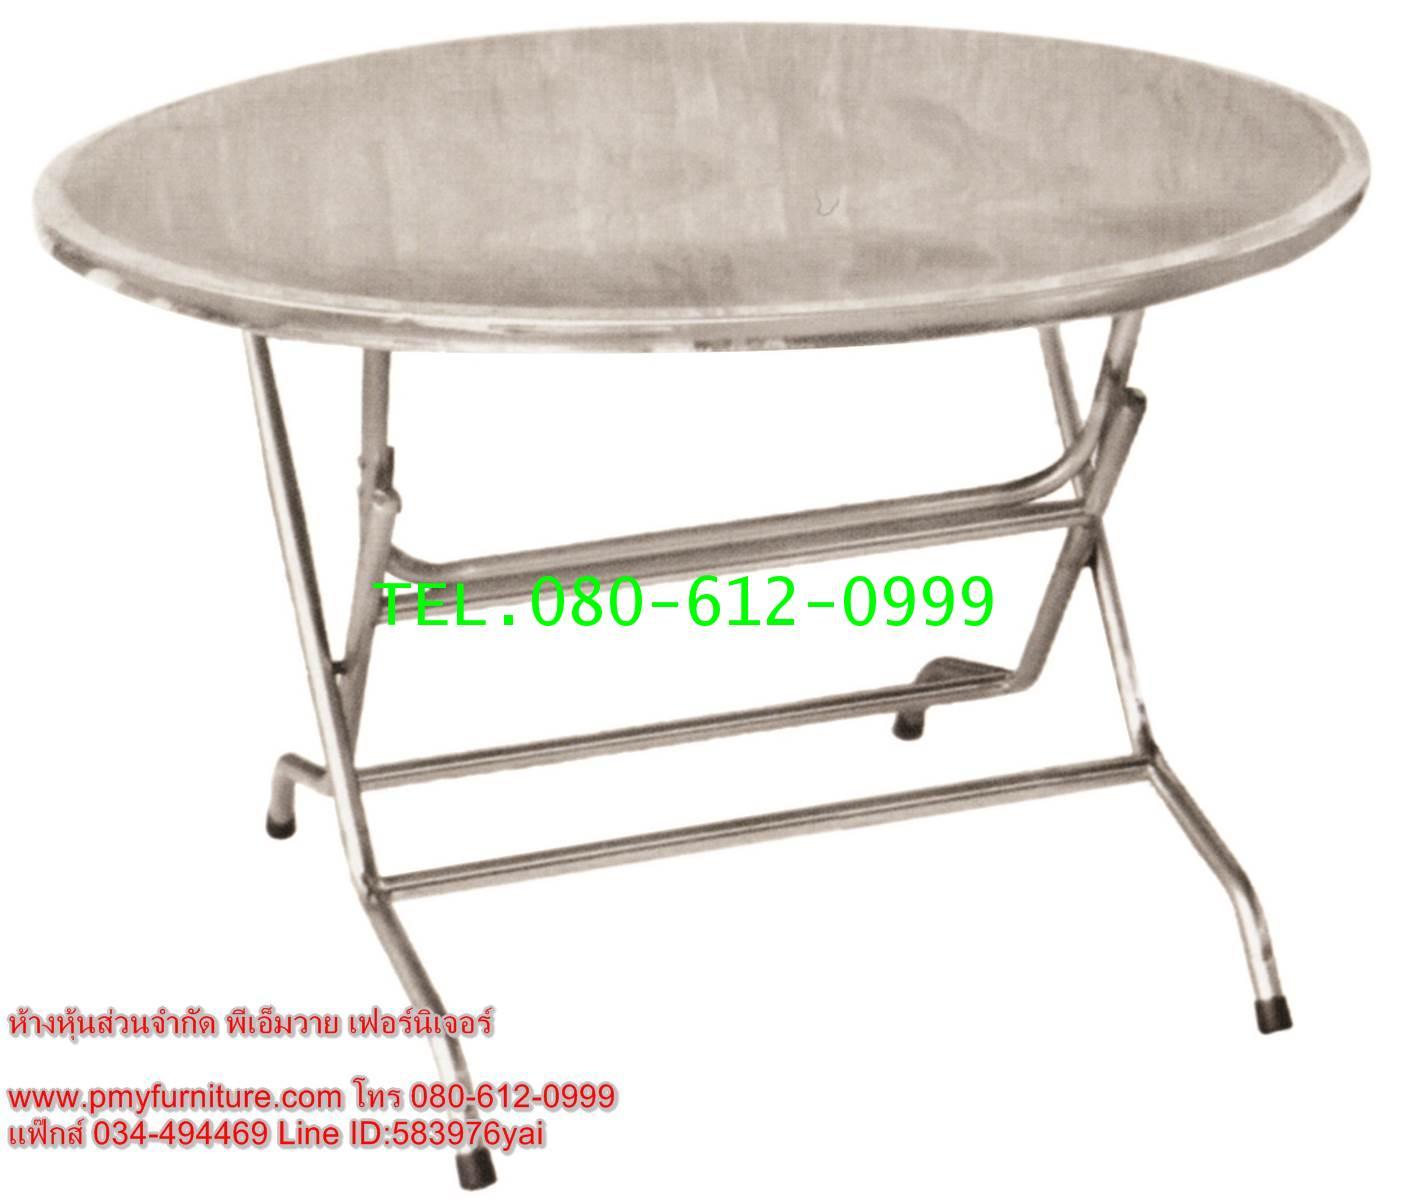 pmy31-3 โต๊ะพับแสตนเลสกลม ขนาด 120 ซม.